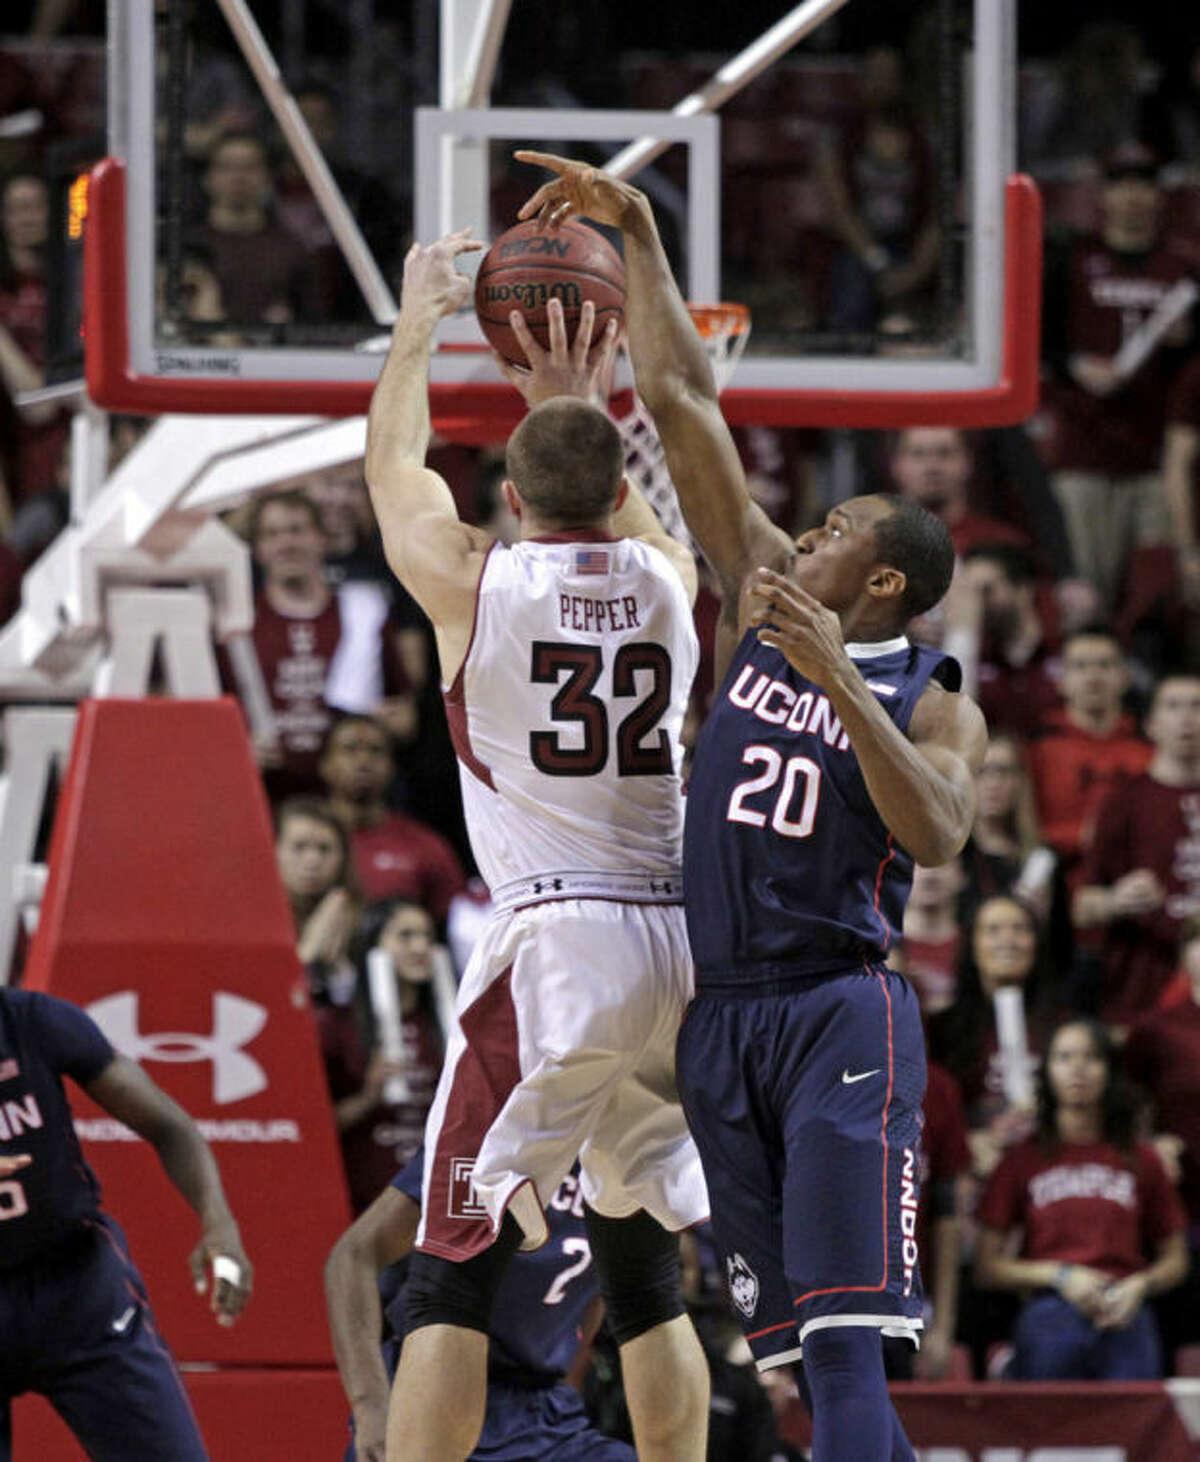 Connecticut's Lasan Kromah (20) blocks a shot by Temple's Dalton Pepper (32) in the first half of an NCAA college basketball game, Thursday, Feb. 20, 2014 in Philadelphia. (AP Photo/H. Rumph Jr.)